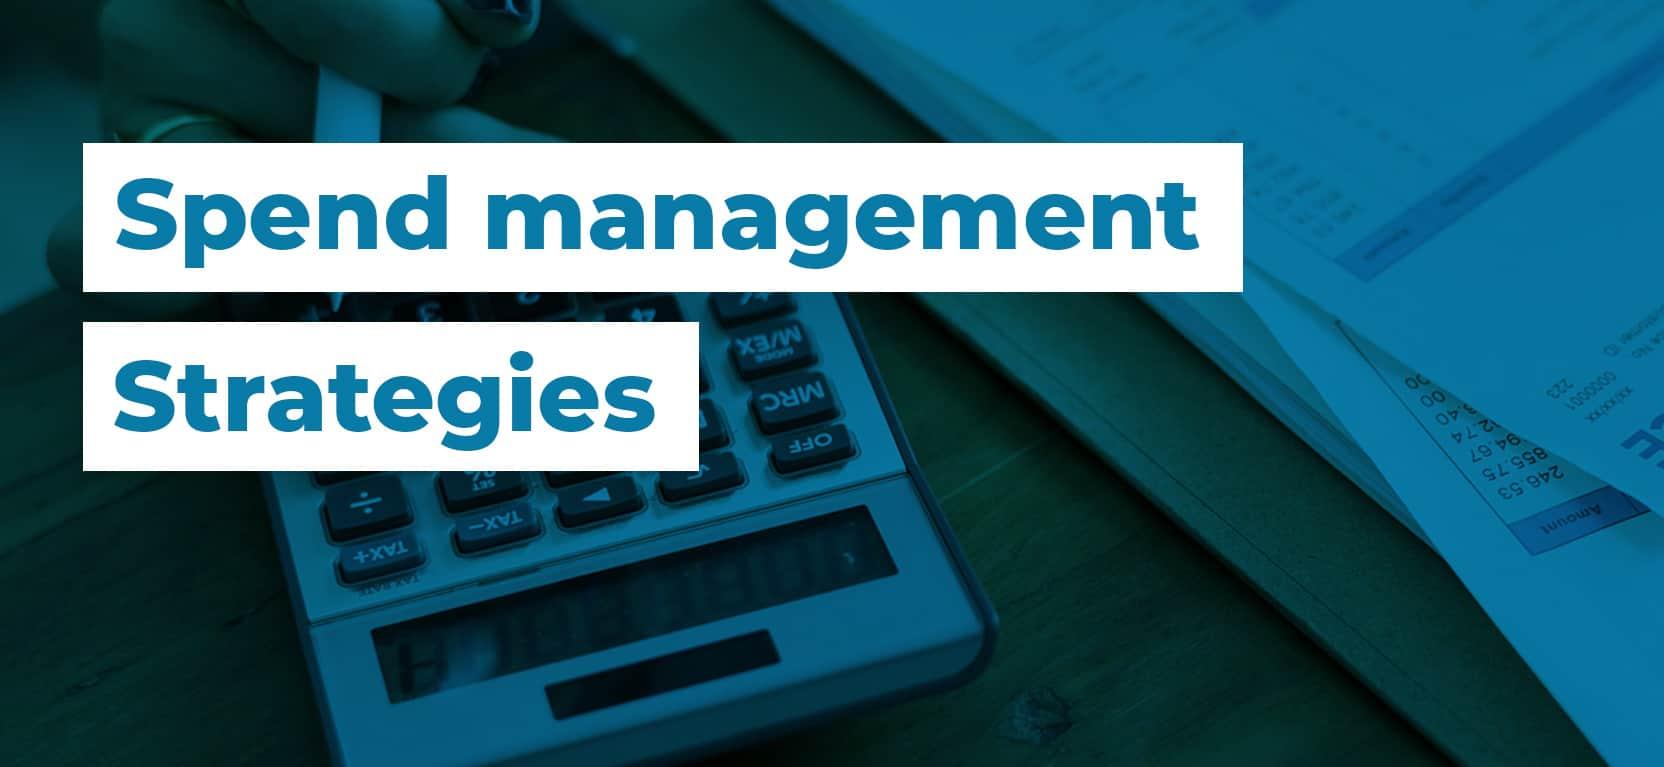 07 Spend management Strategies3